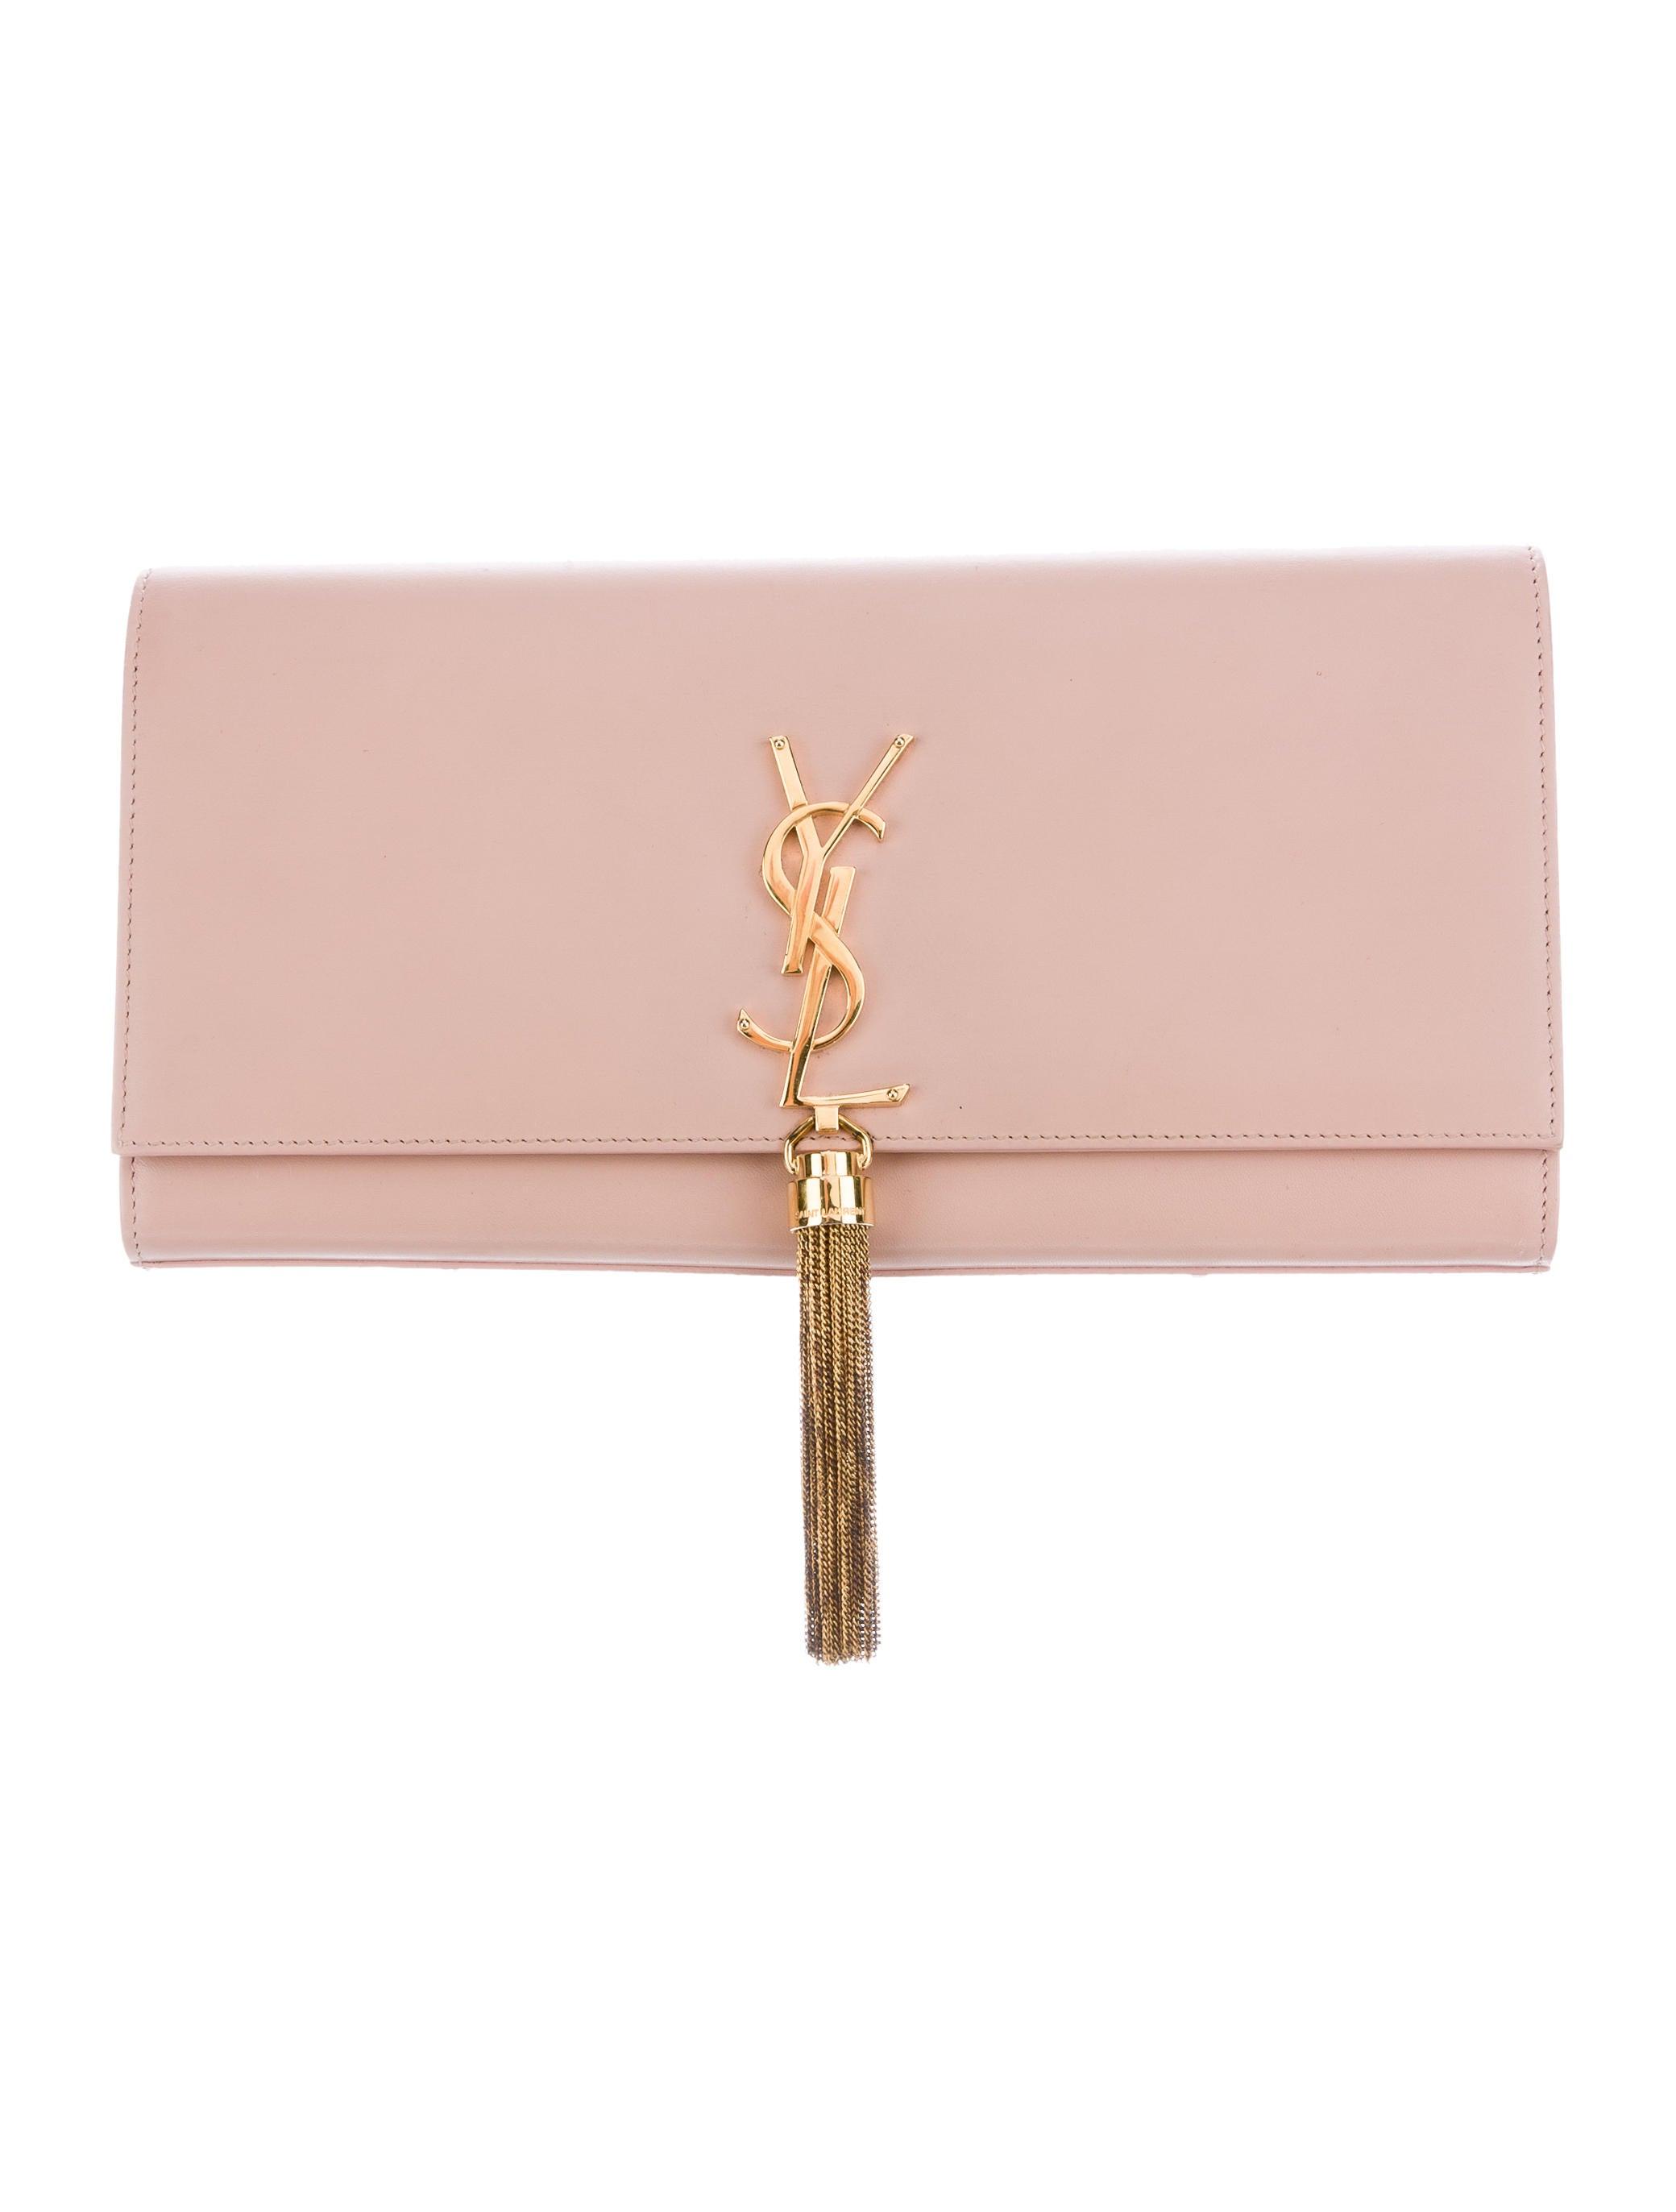 a10ff750fd8 Yves Saint Laurent Cassandre Tassel Clutch - Handbags - YVE63159 ...